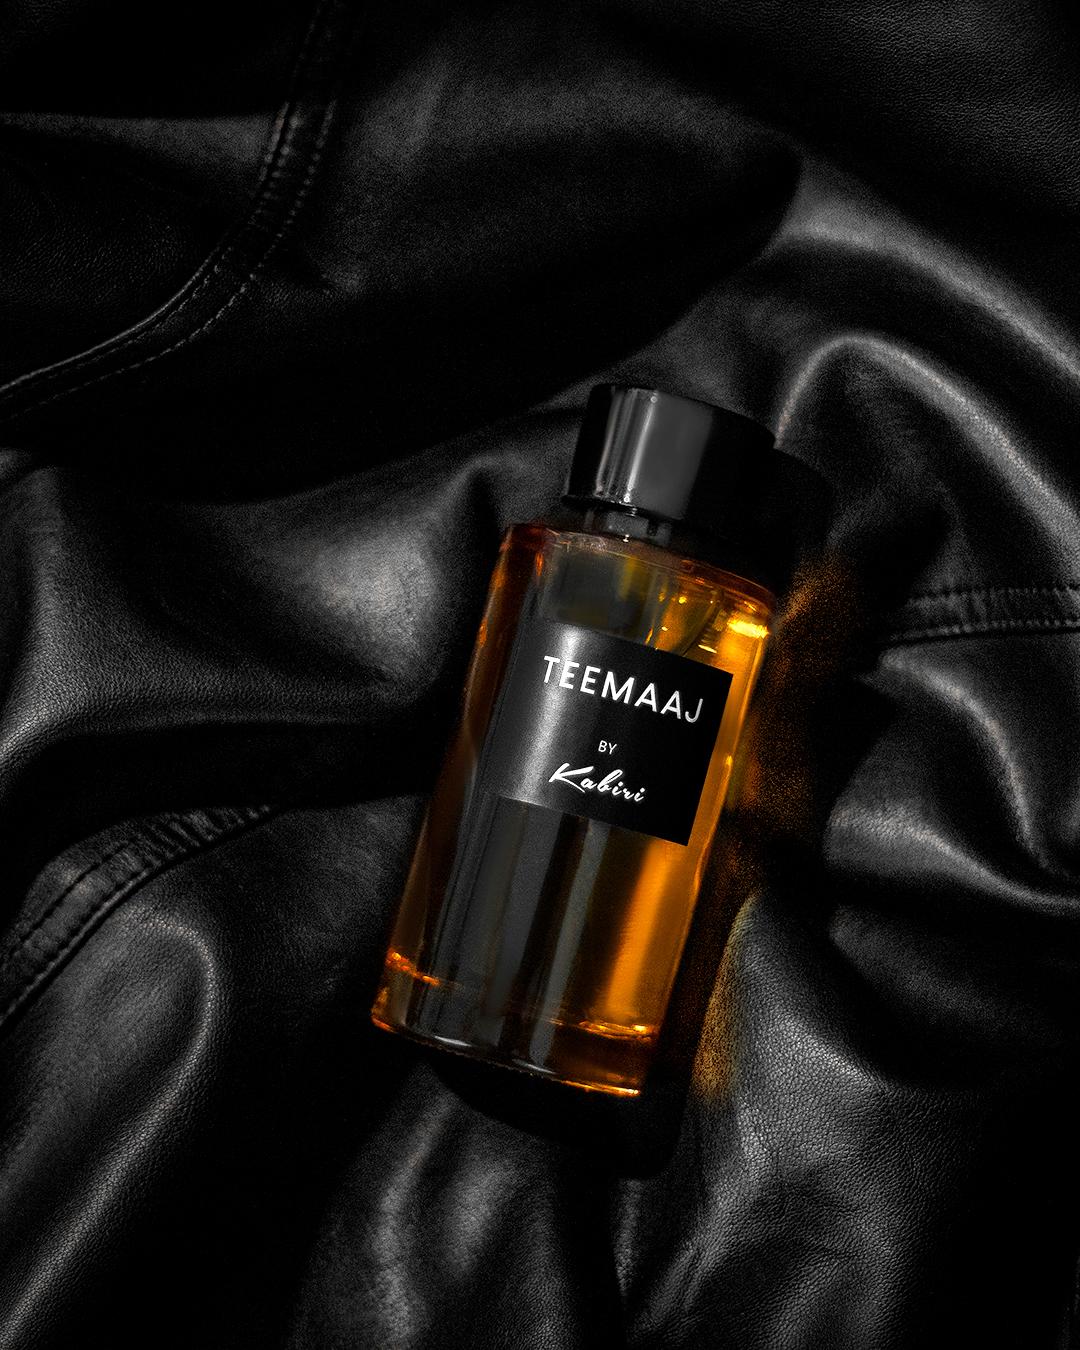 teemaaj perfume photo s.jpg